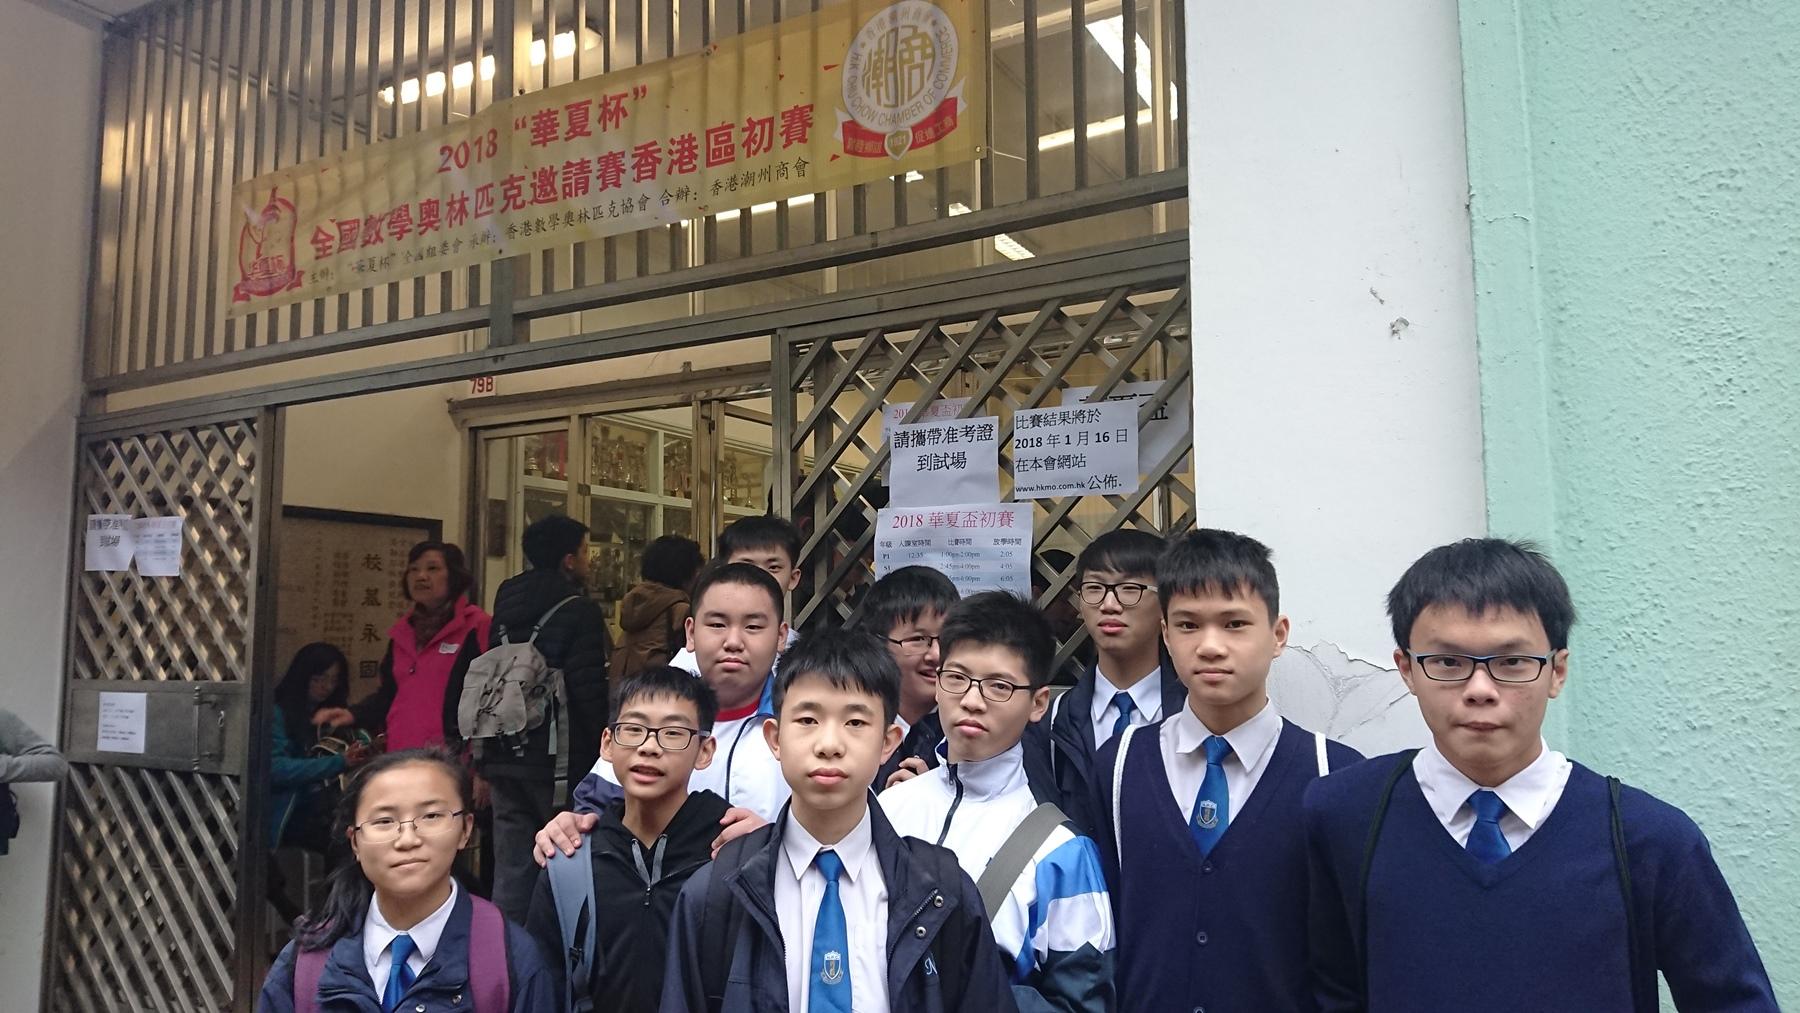 http://npc.edu.hk/sites/default/files/dscpdc_0001_burst20180106162720359.jpg